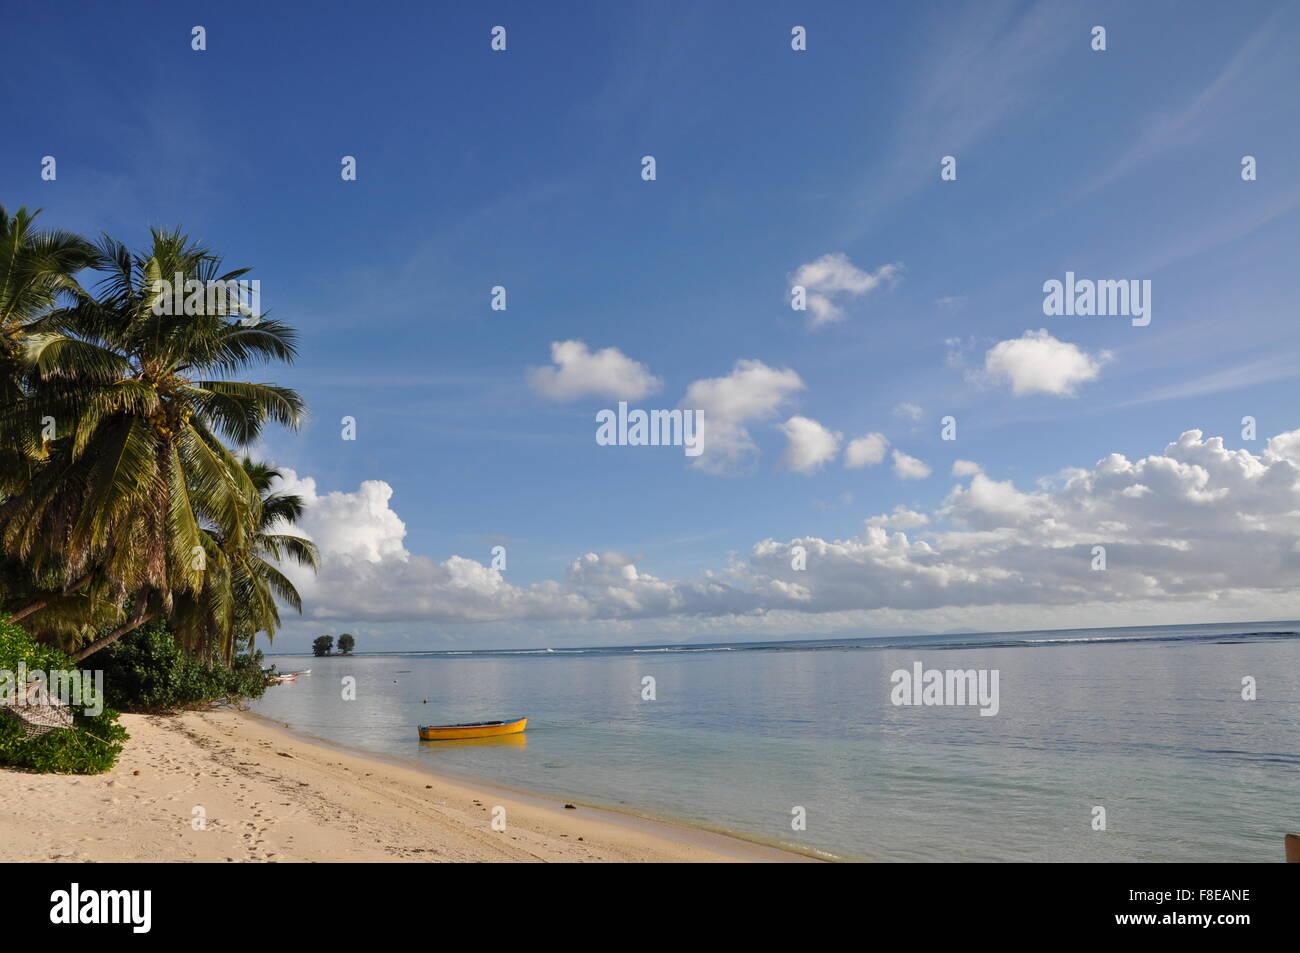 A small dinghy on a tropical beach, La Digue Island, Seychelles Stock Photo